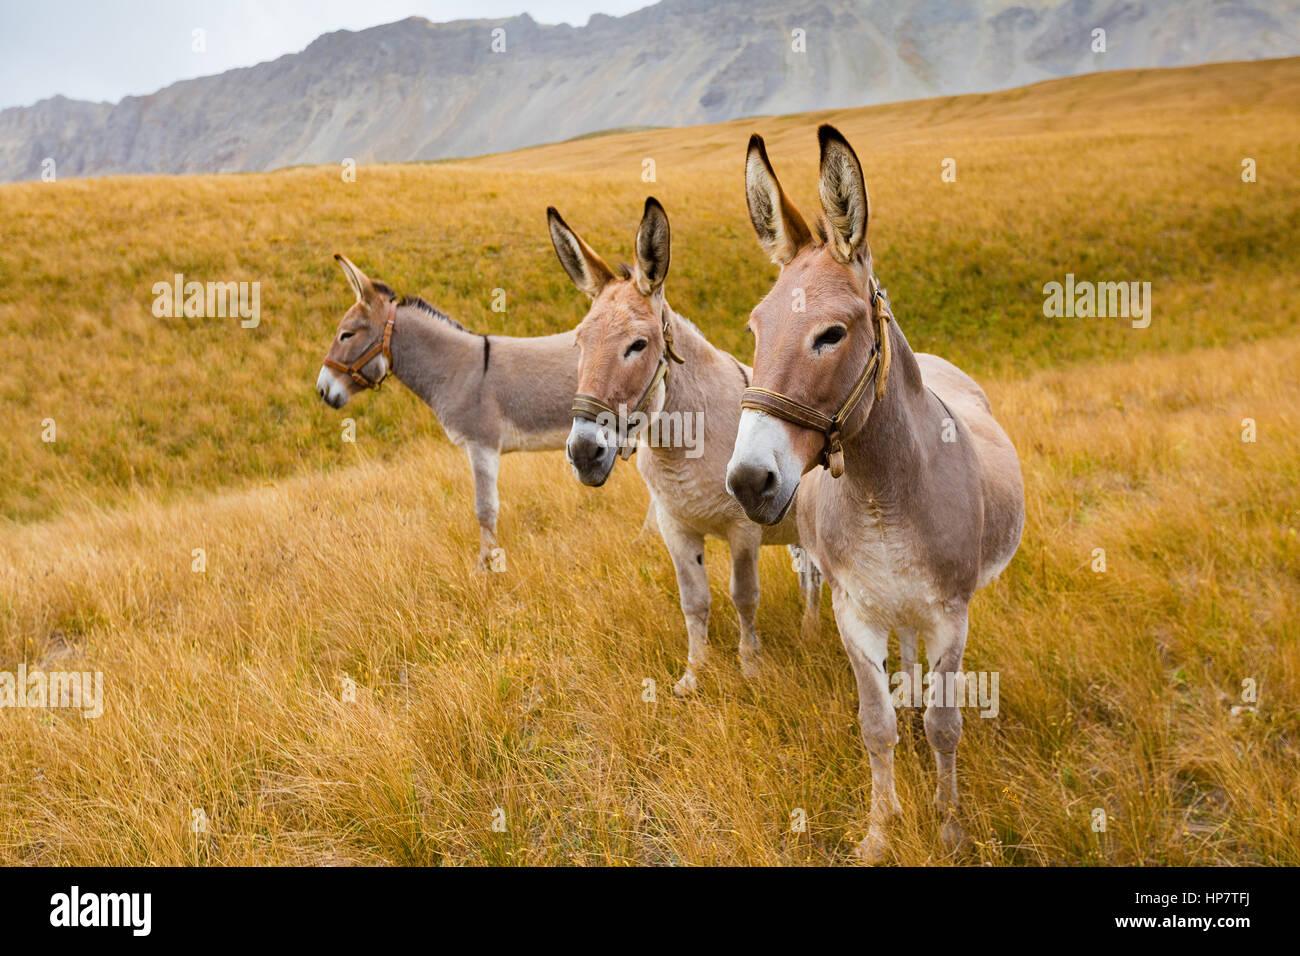 Donkeys, alpine grassland, Col des Thures. Vallée Etroite. - Stock Image